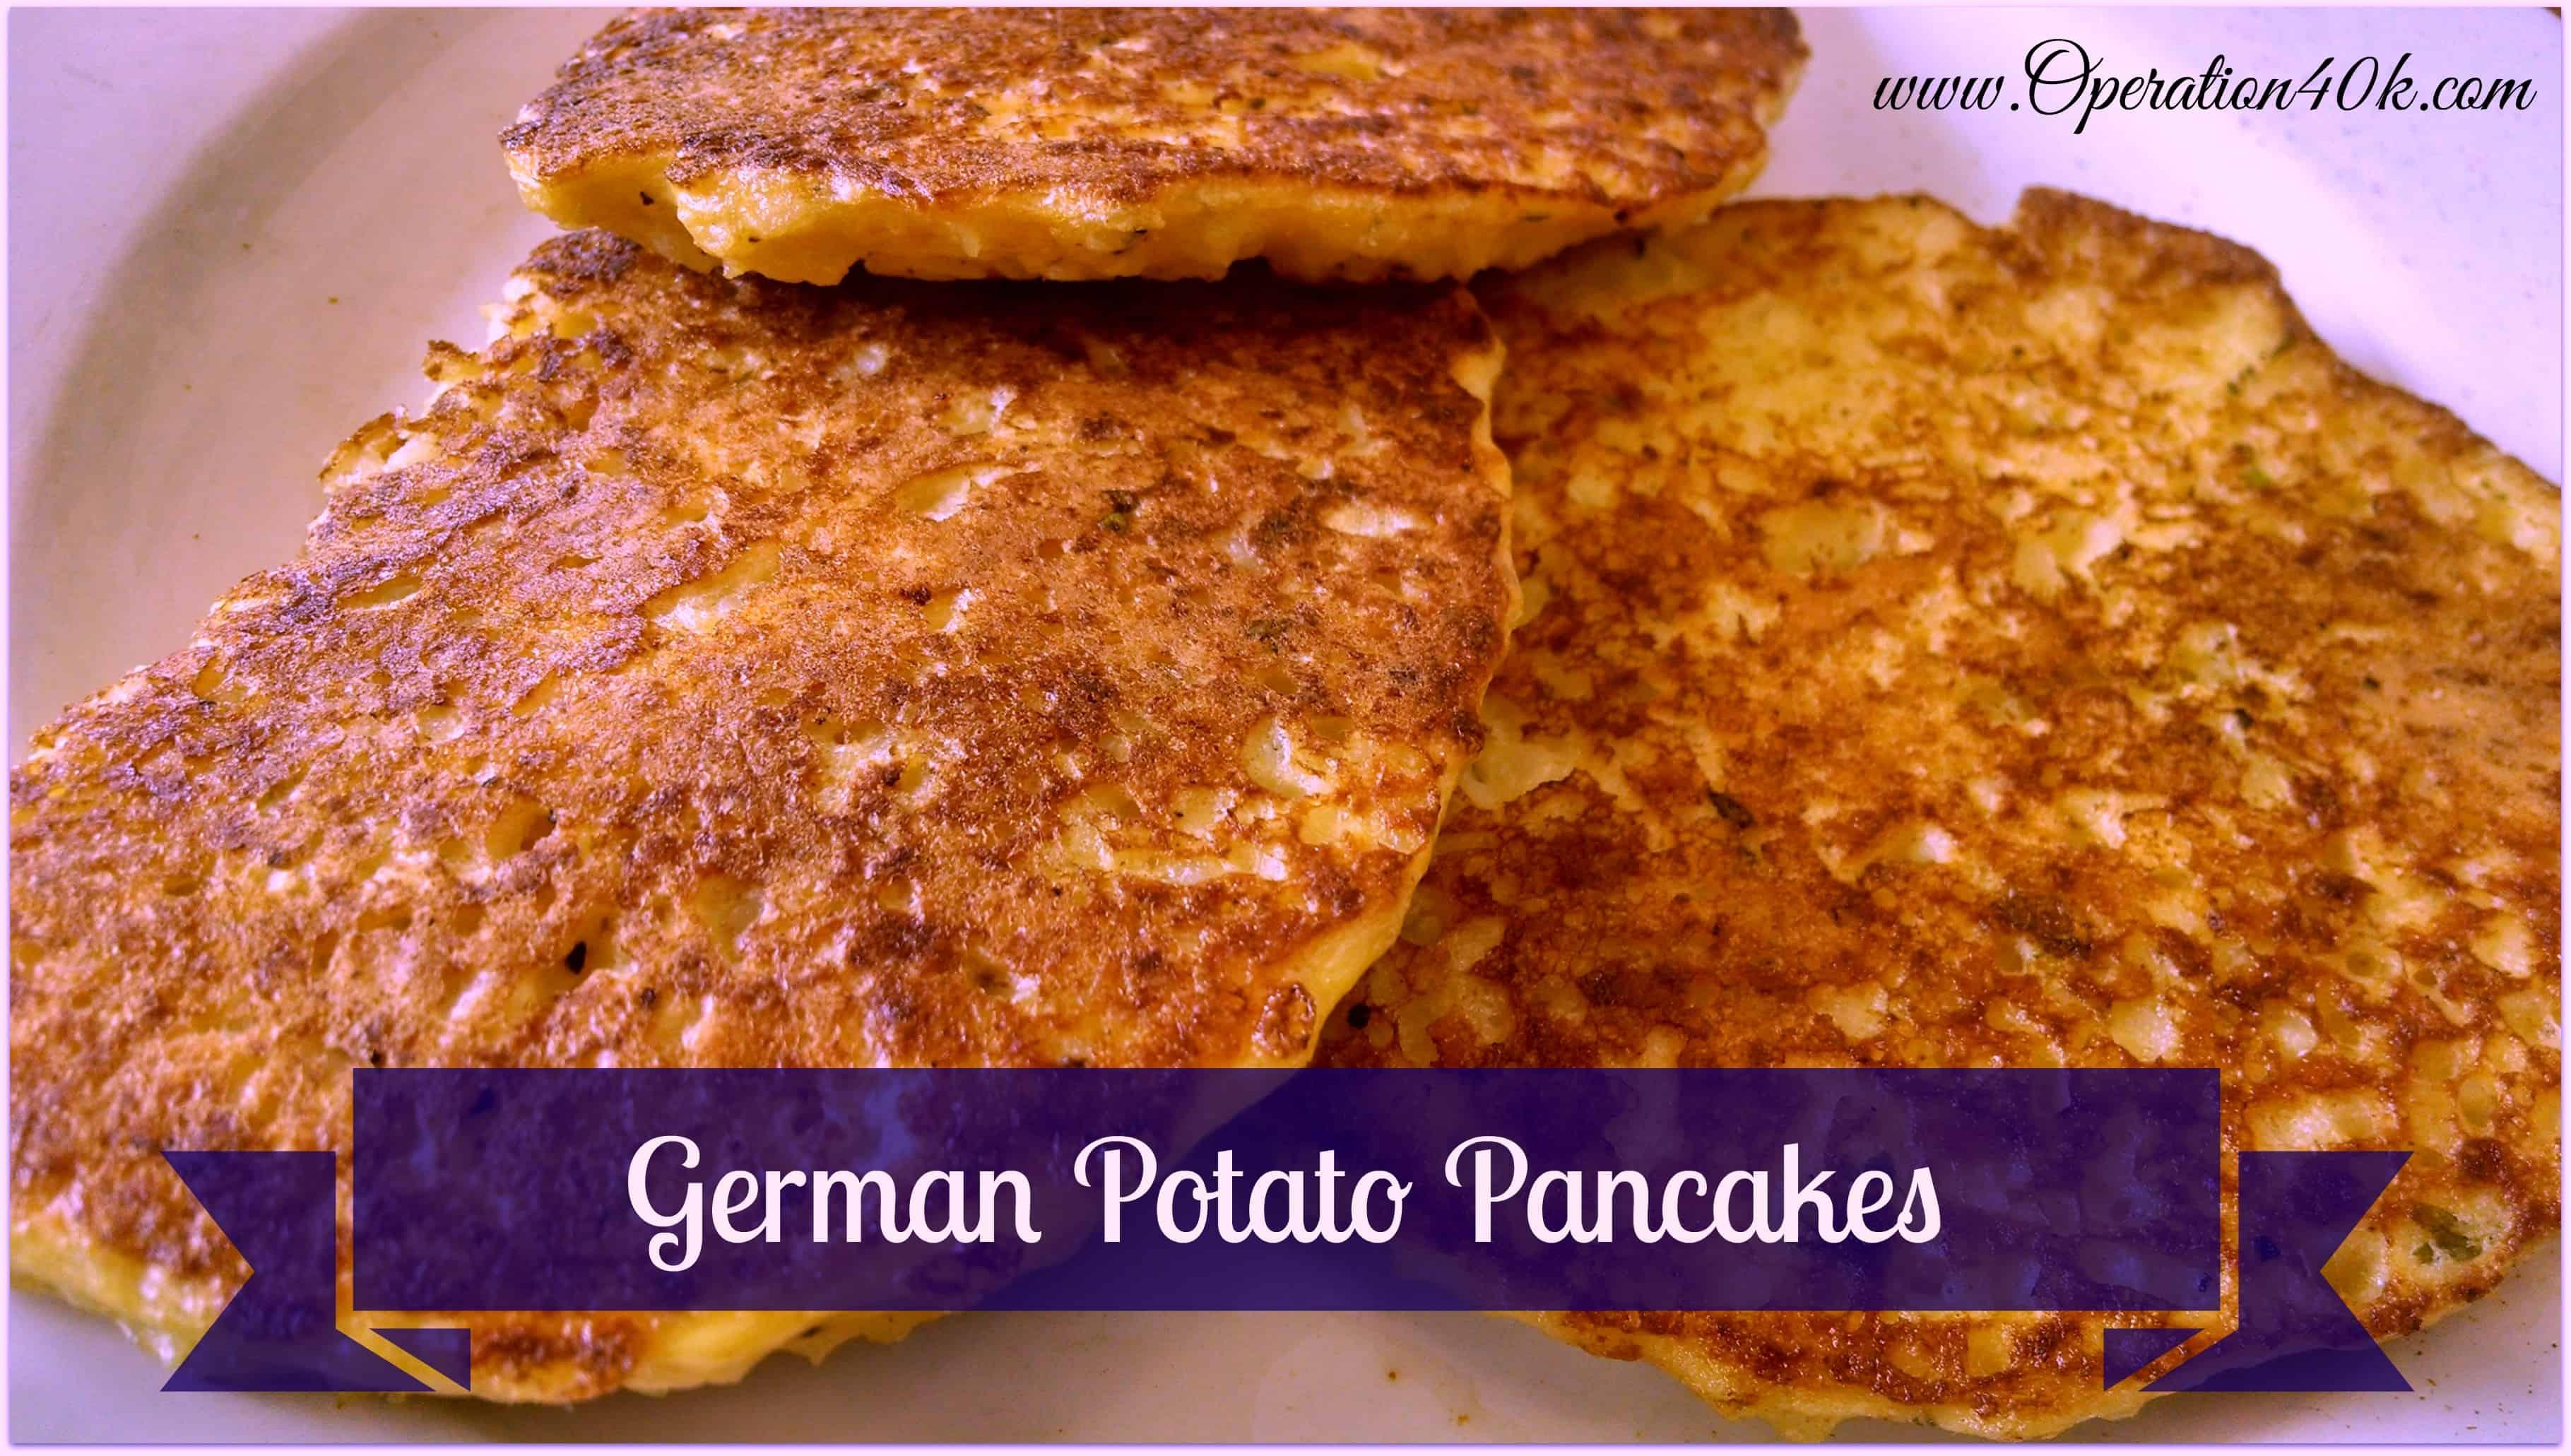 German potato pancake recipe operation 40k potato pancake this is a simple recipe forumfinder Gallery